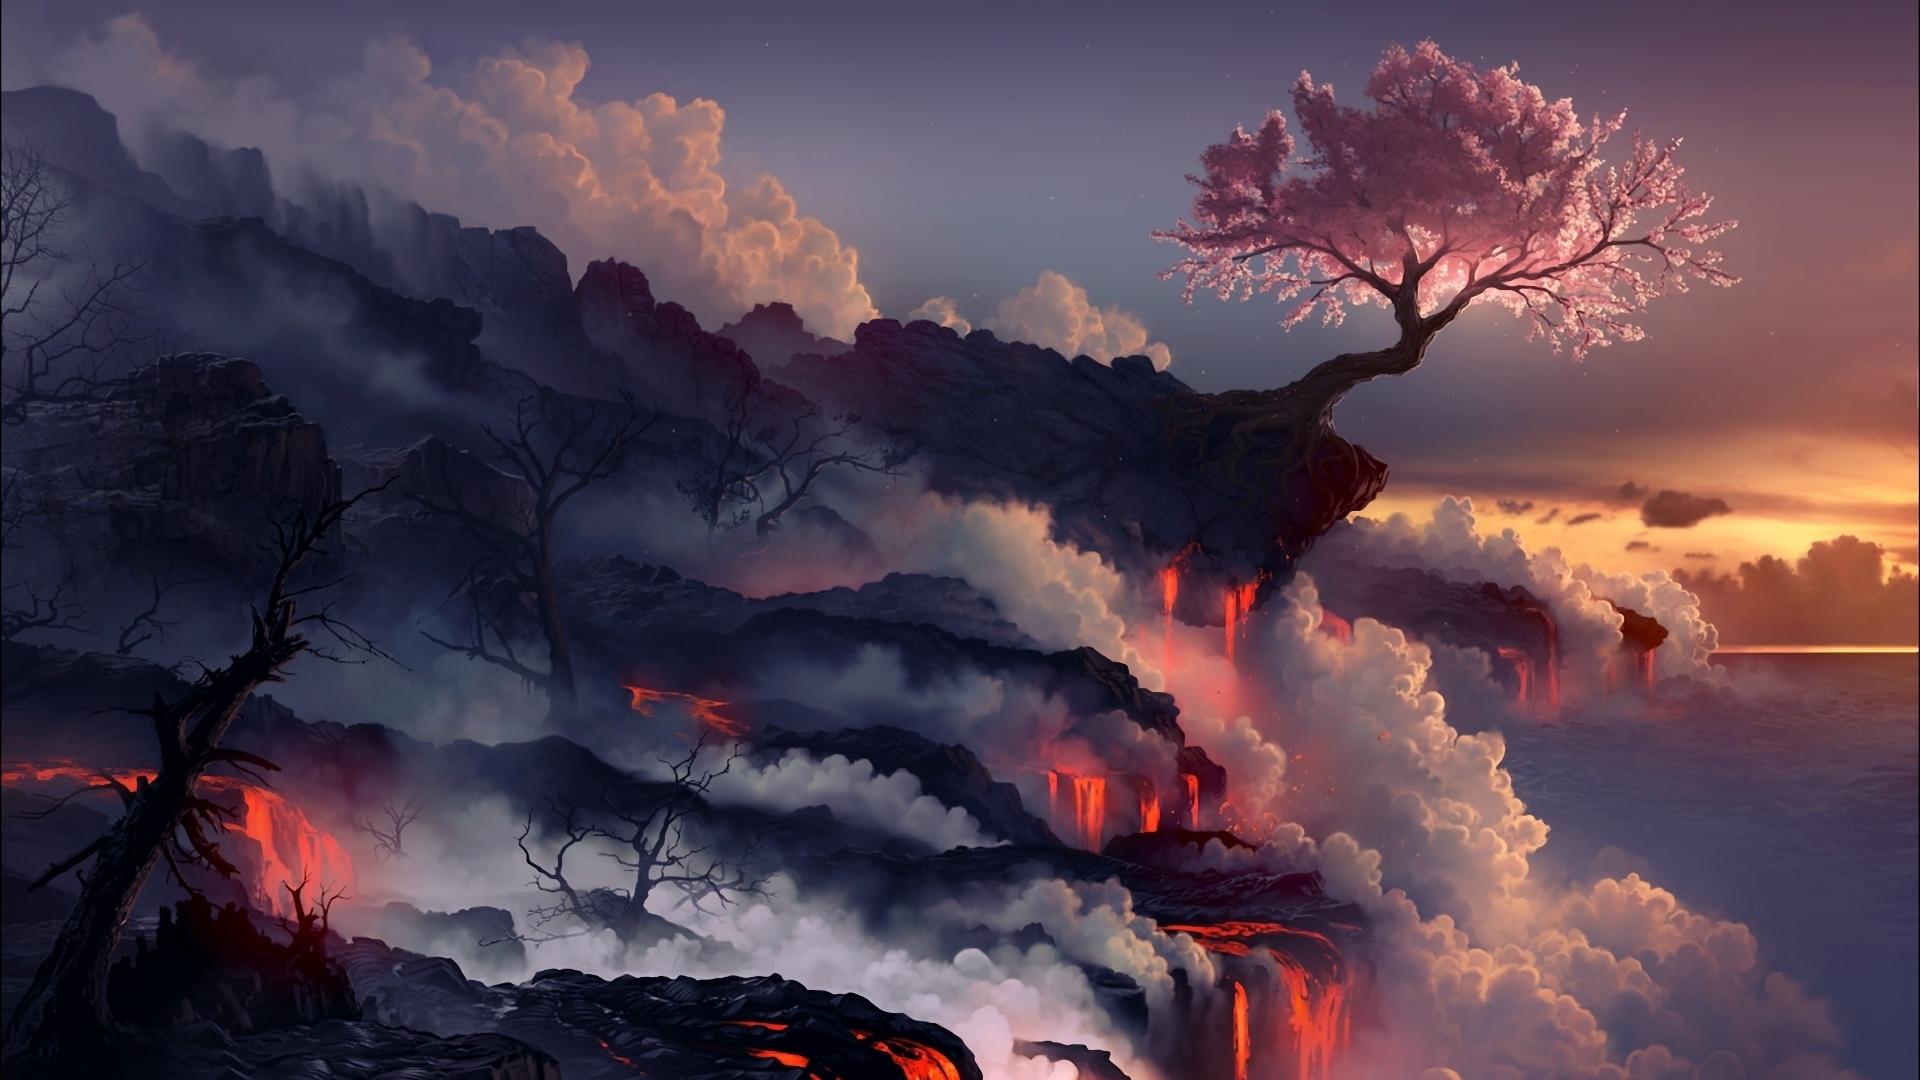 Download wallpaper 1920x1080 eruption lava volcano oriental 1920x1080